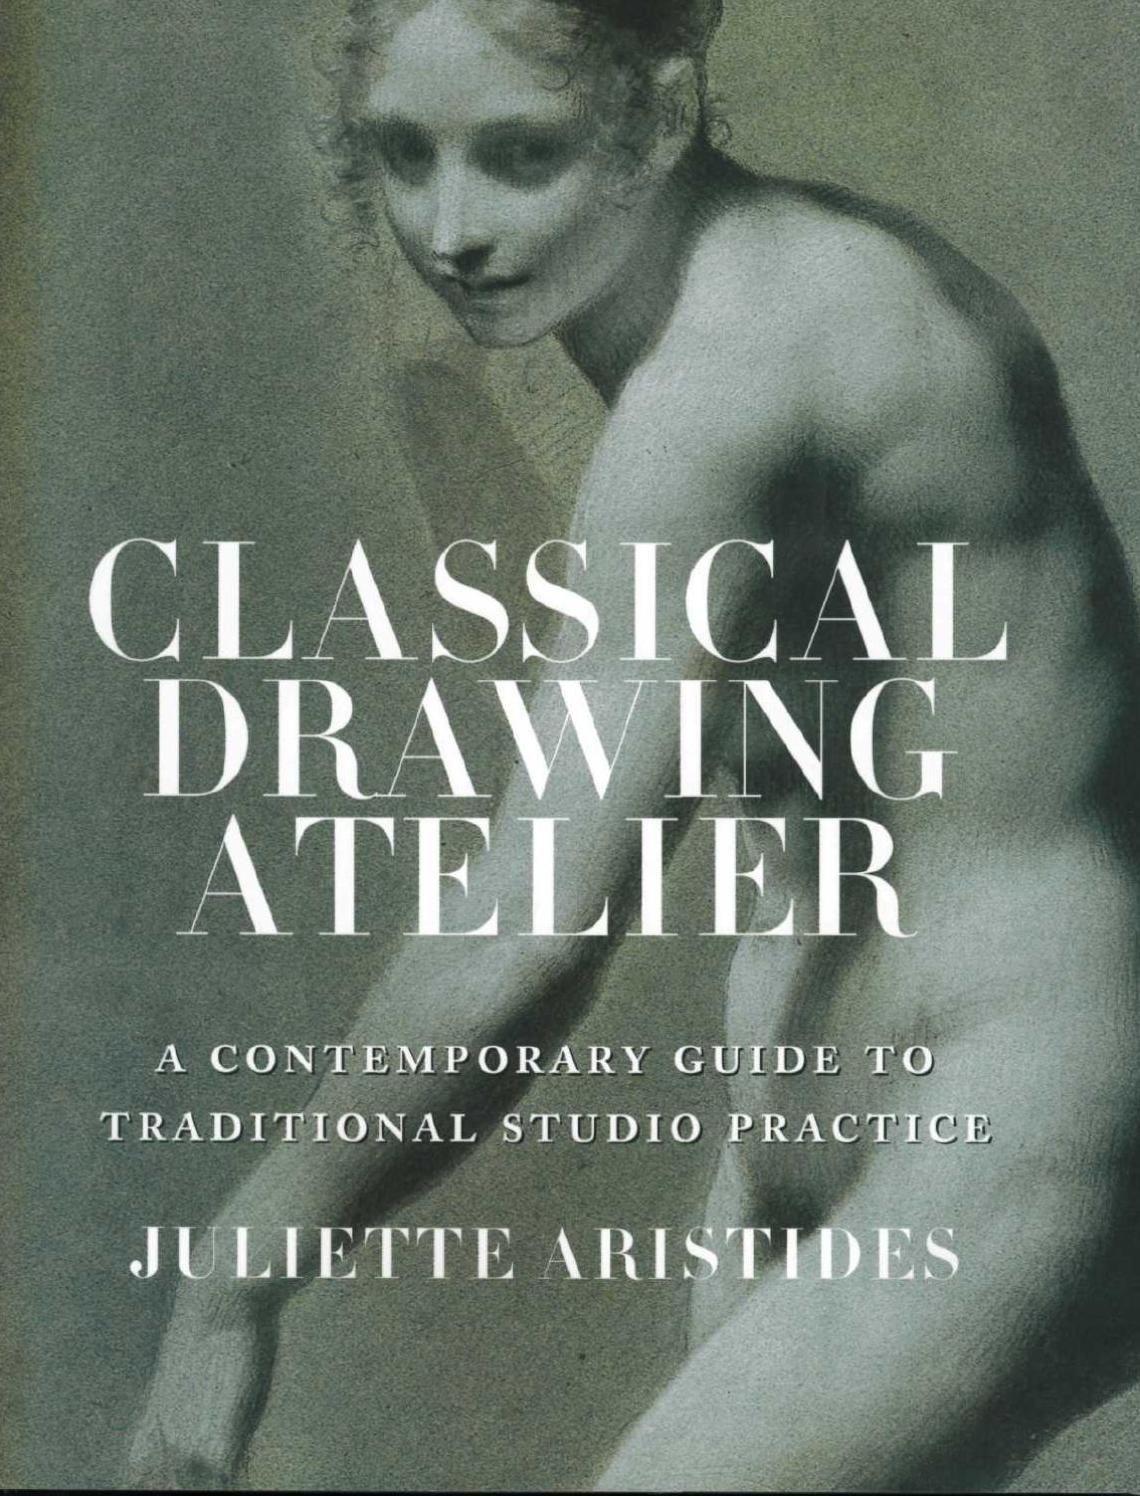 Classical-Drawing-Atelier-Juliette-Aristides_2 | Pinterest | Anatomía